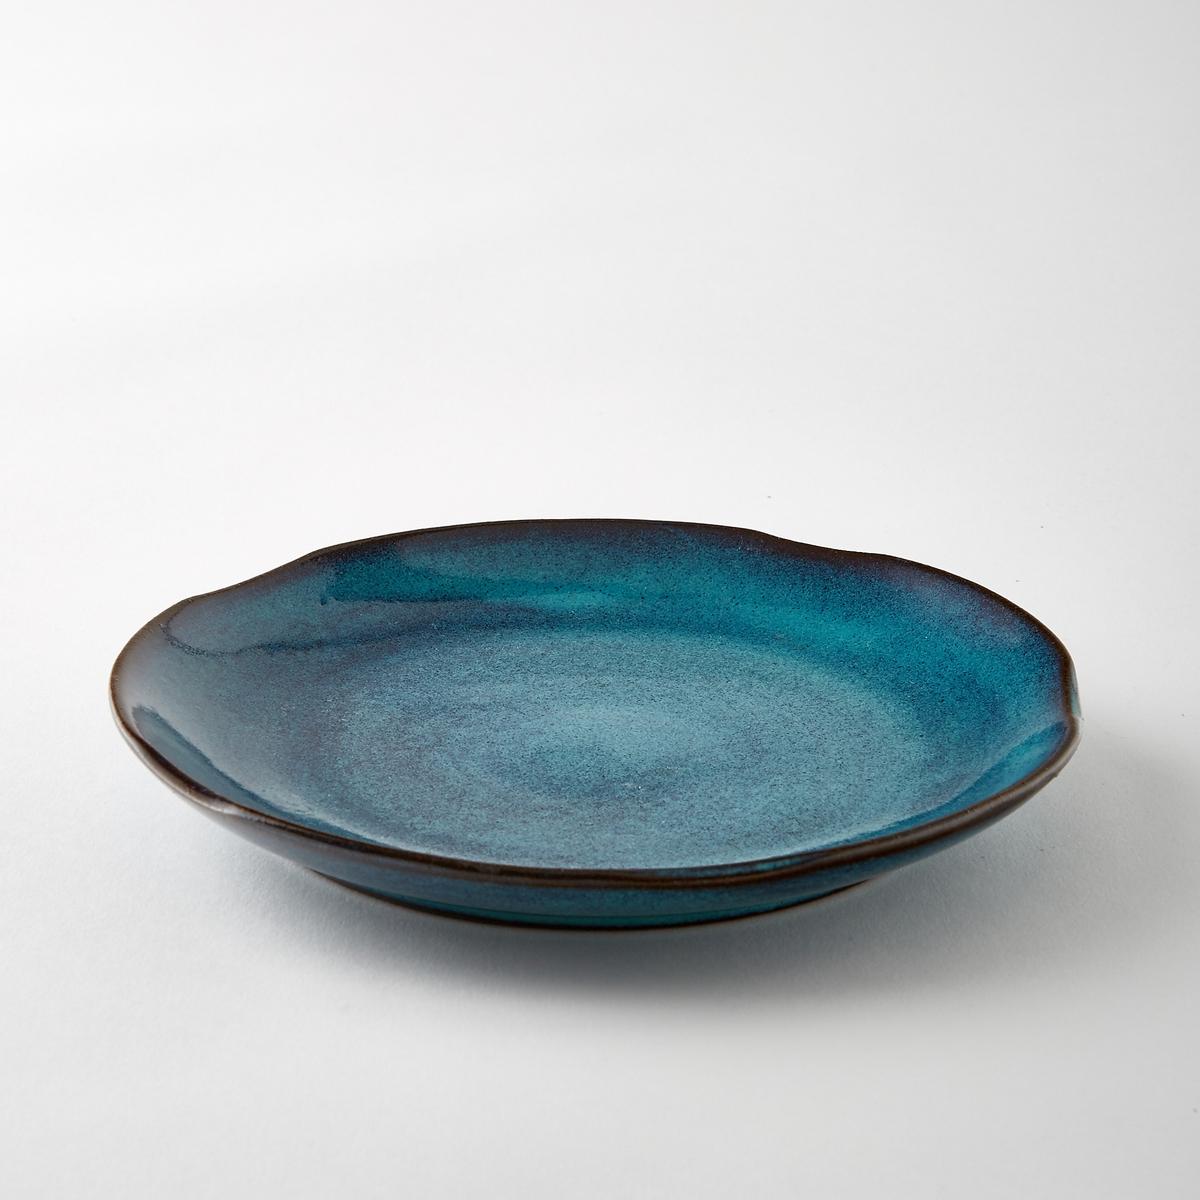 Тарелка десертная из керамики, диаметр 22 см, Aqua от Serax